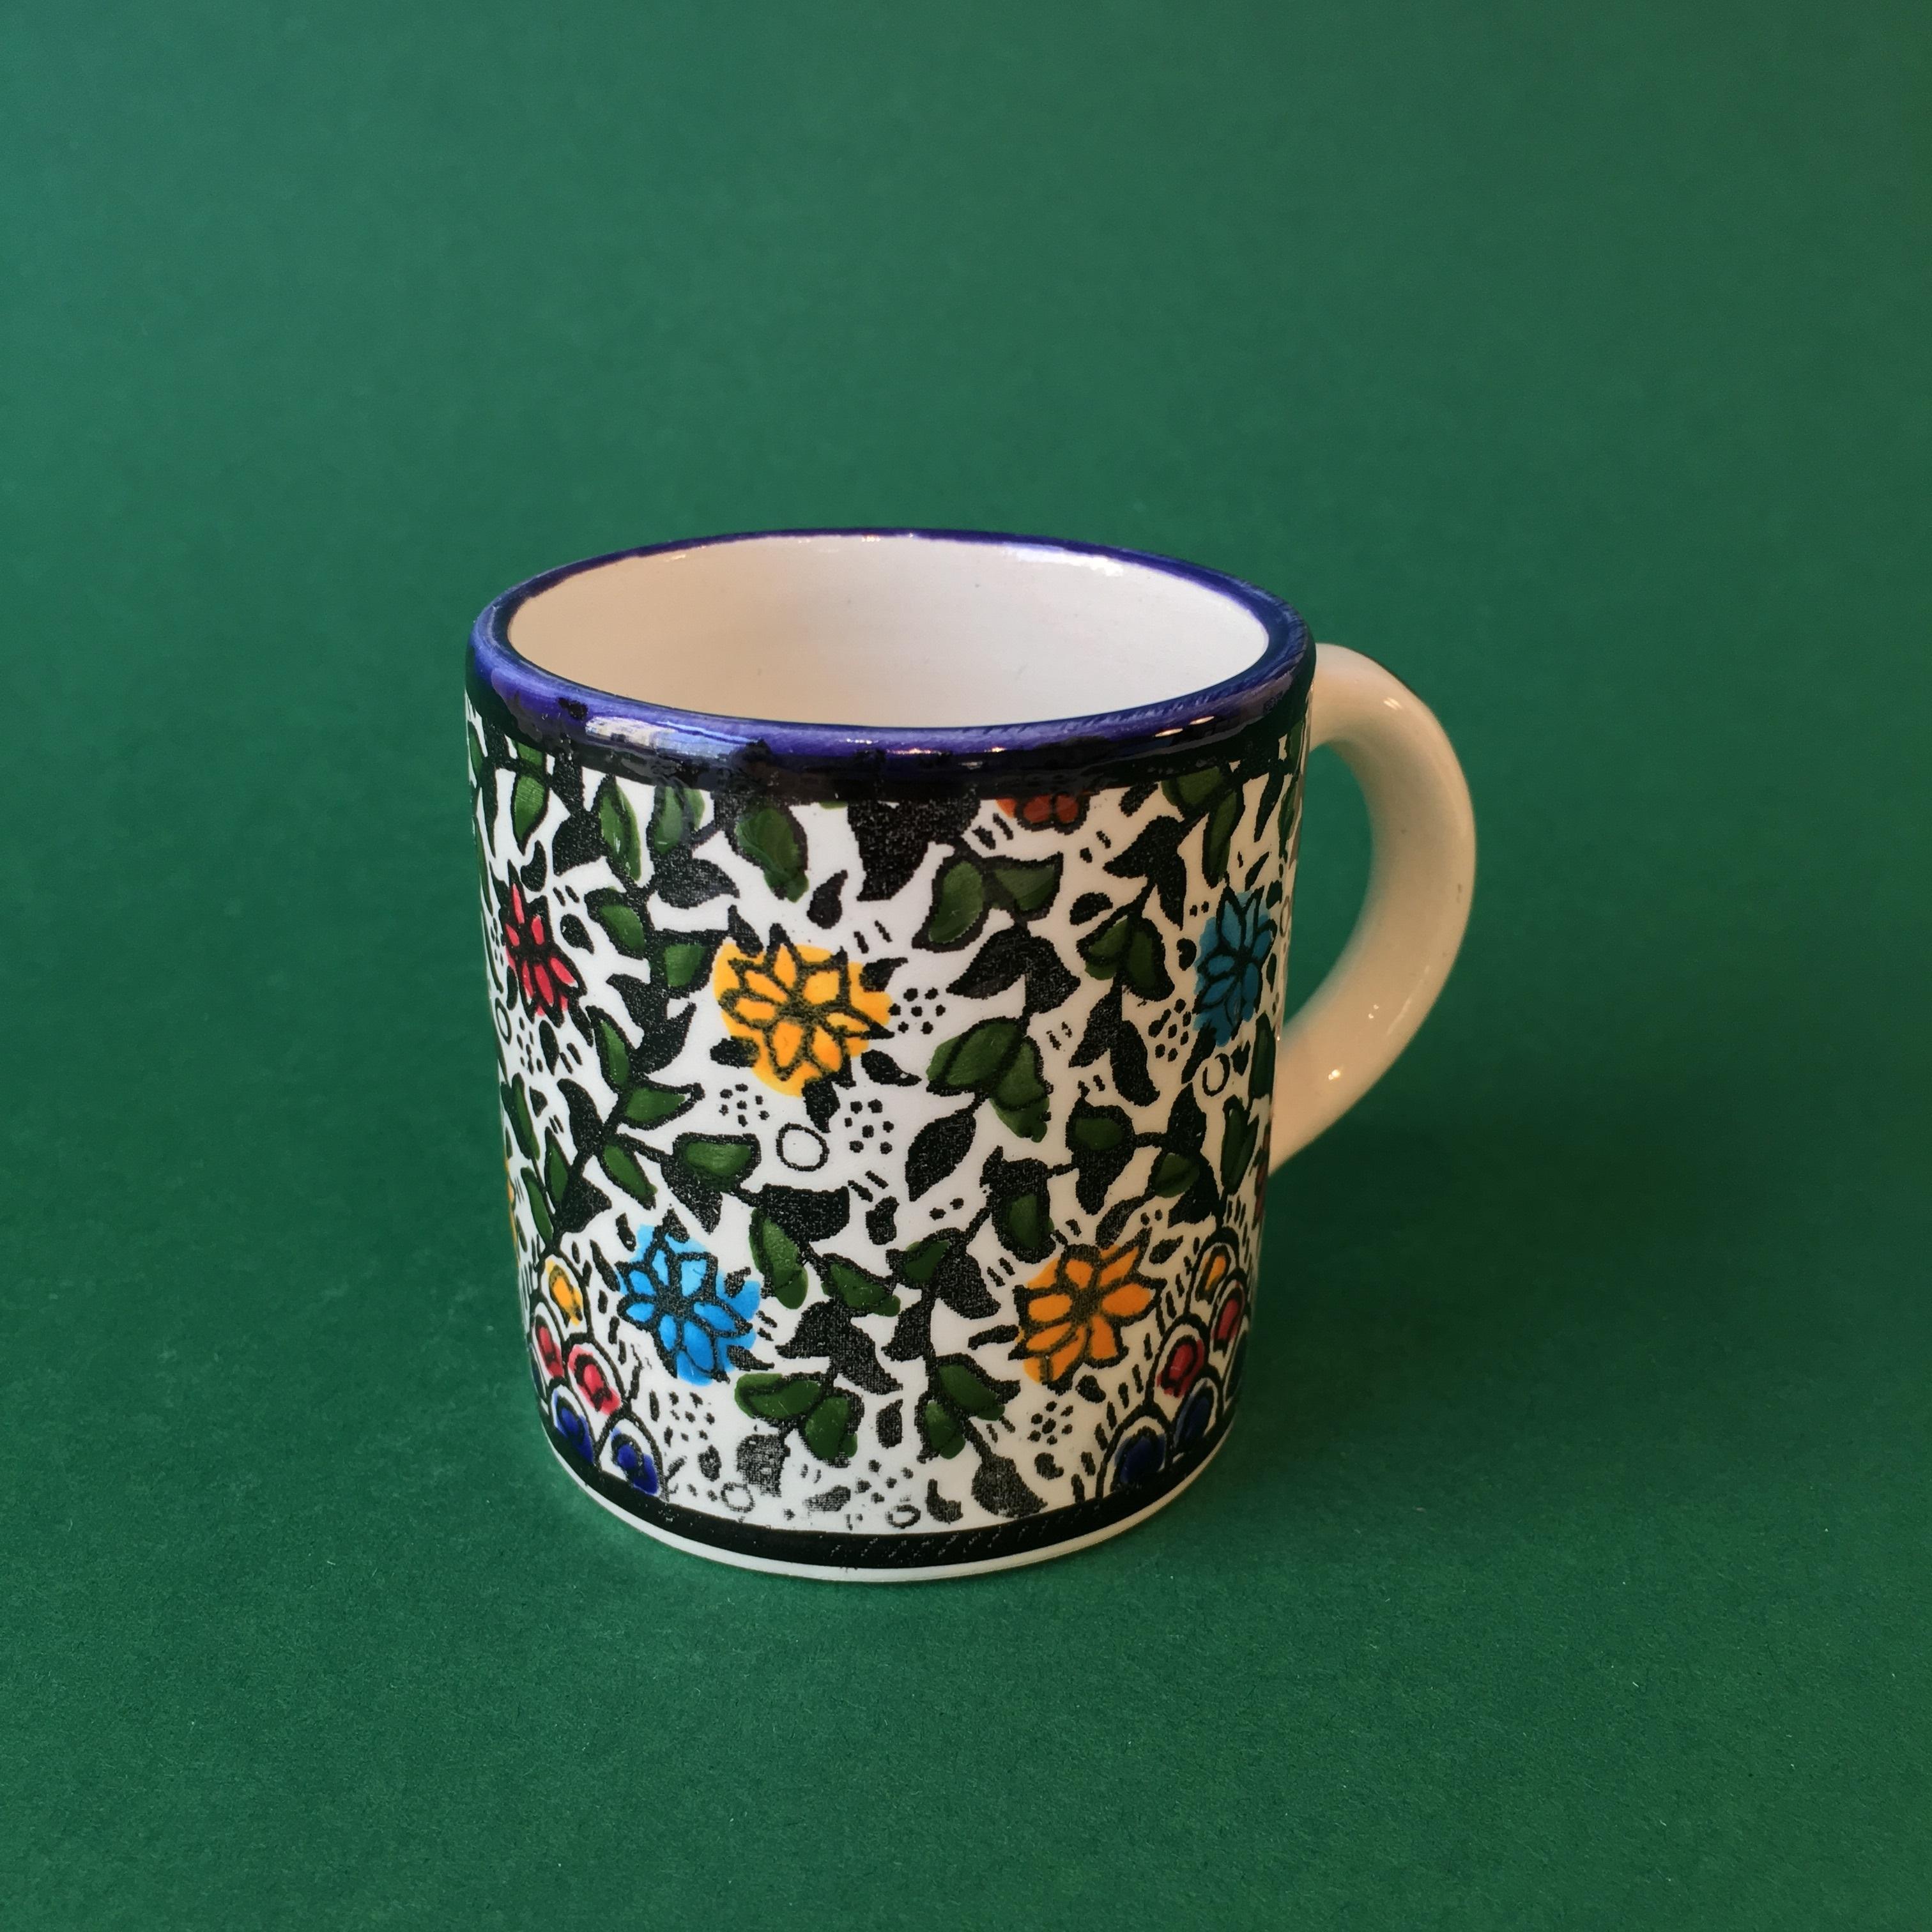 Liten keramikkopp, flerfarget